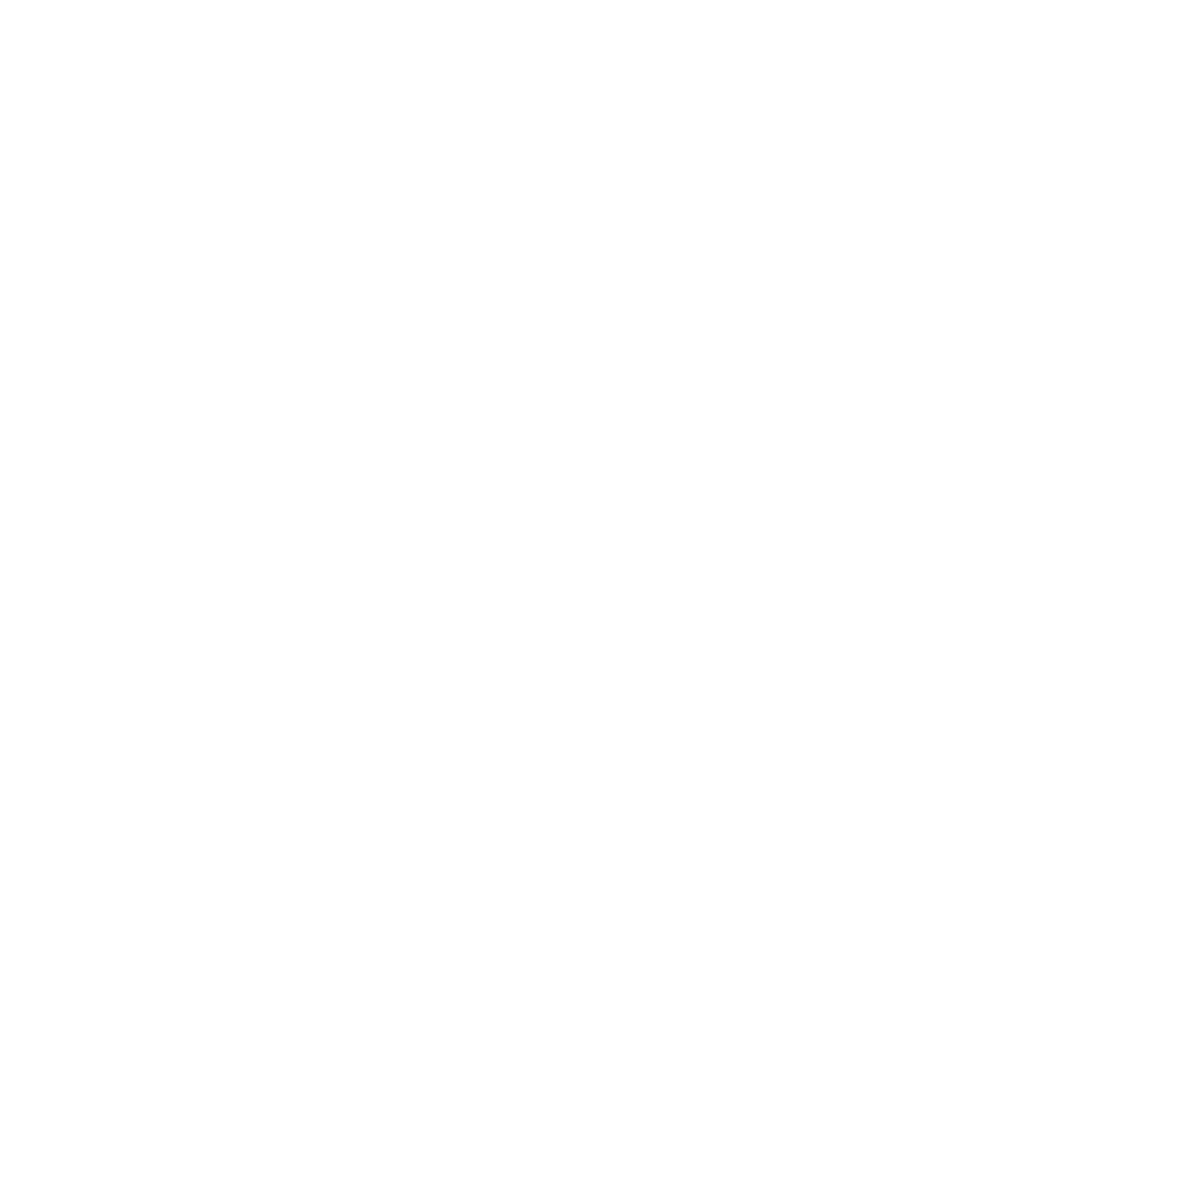 noun_Email_110598_ffffff